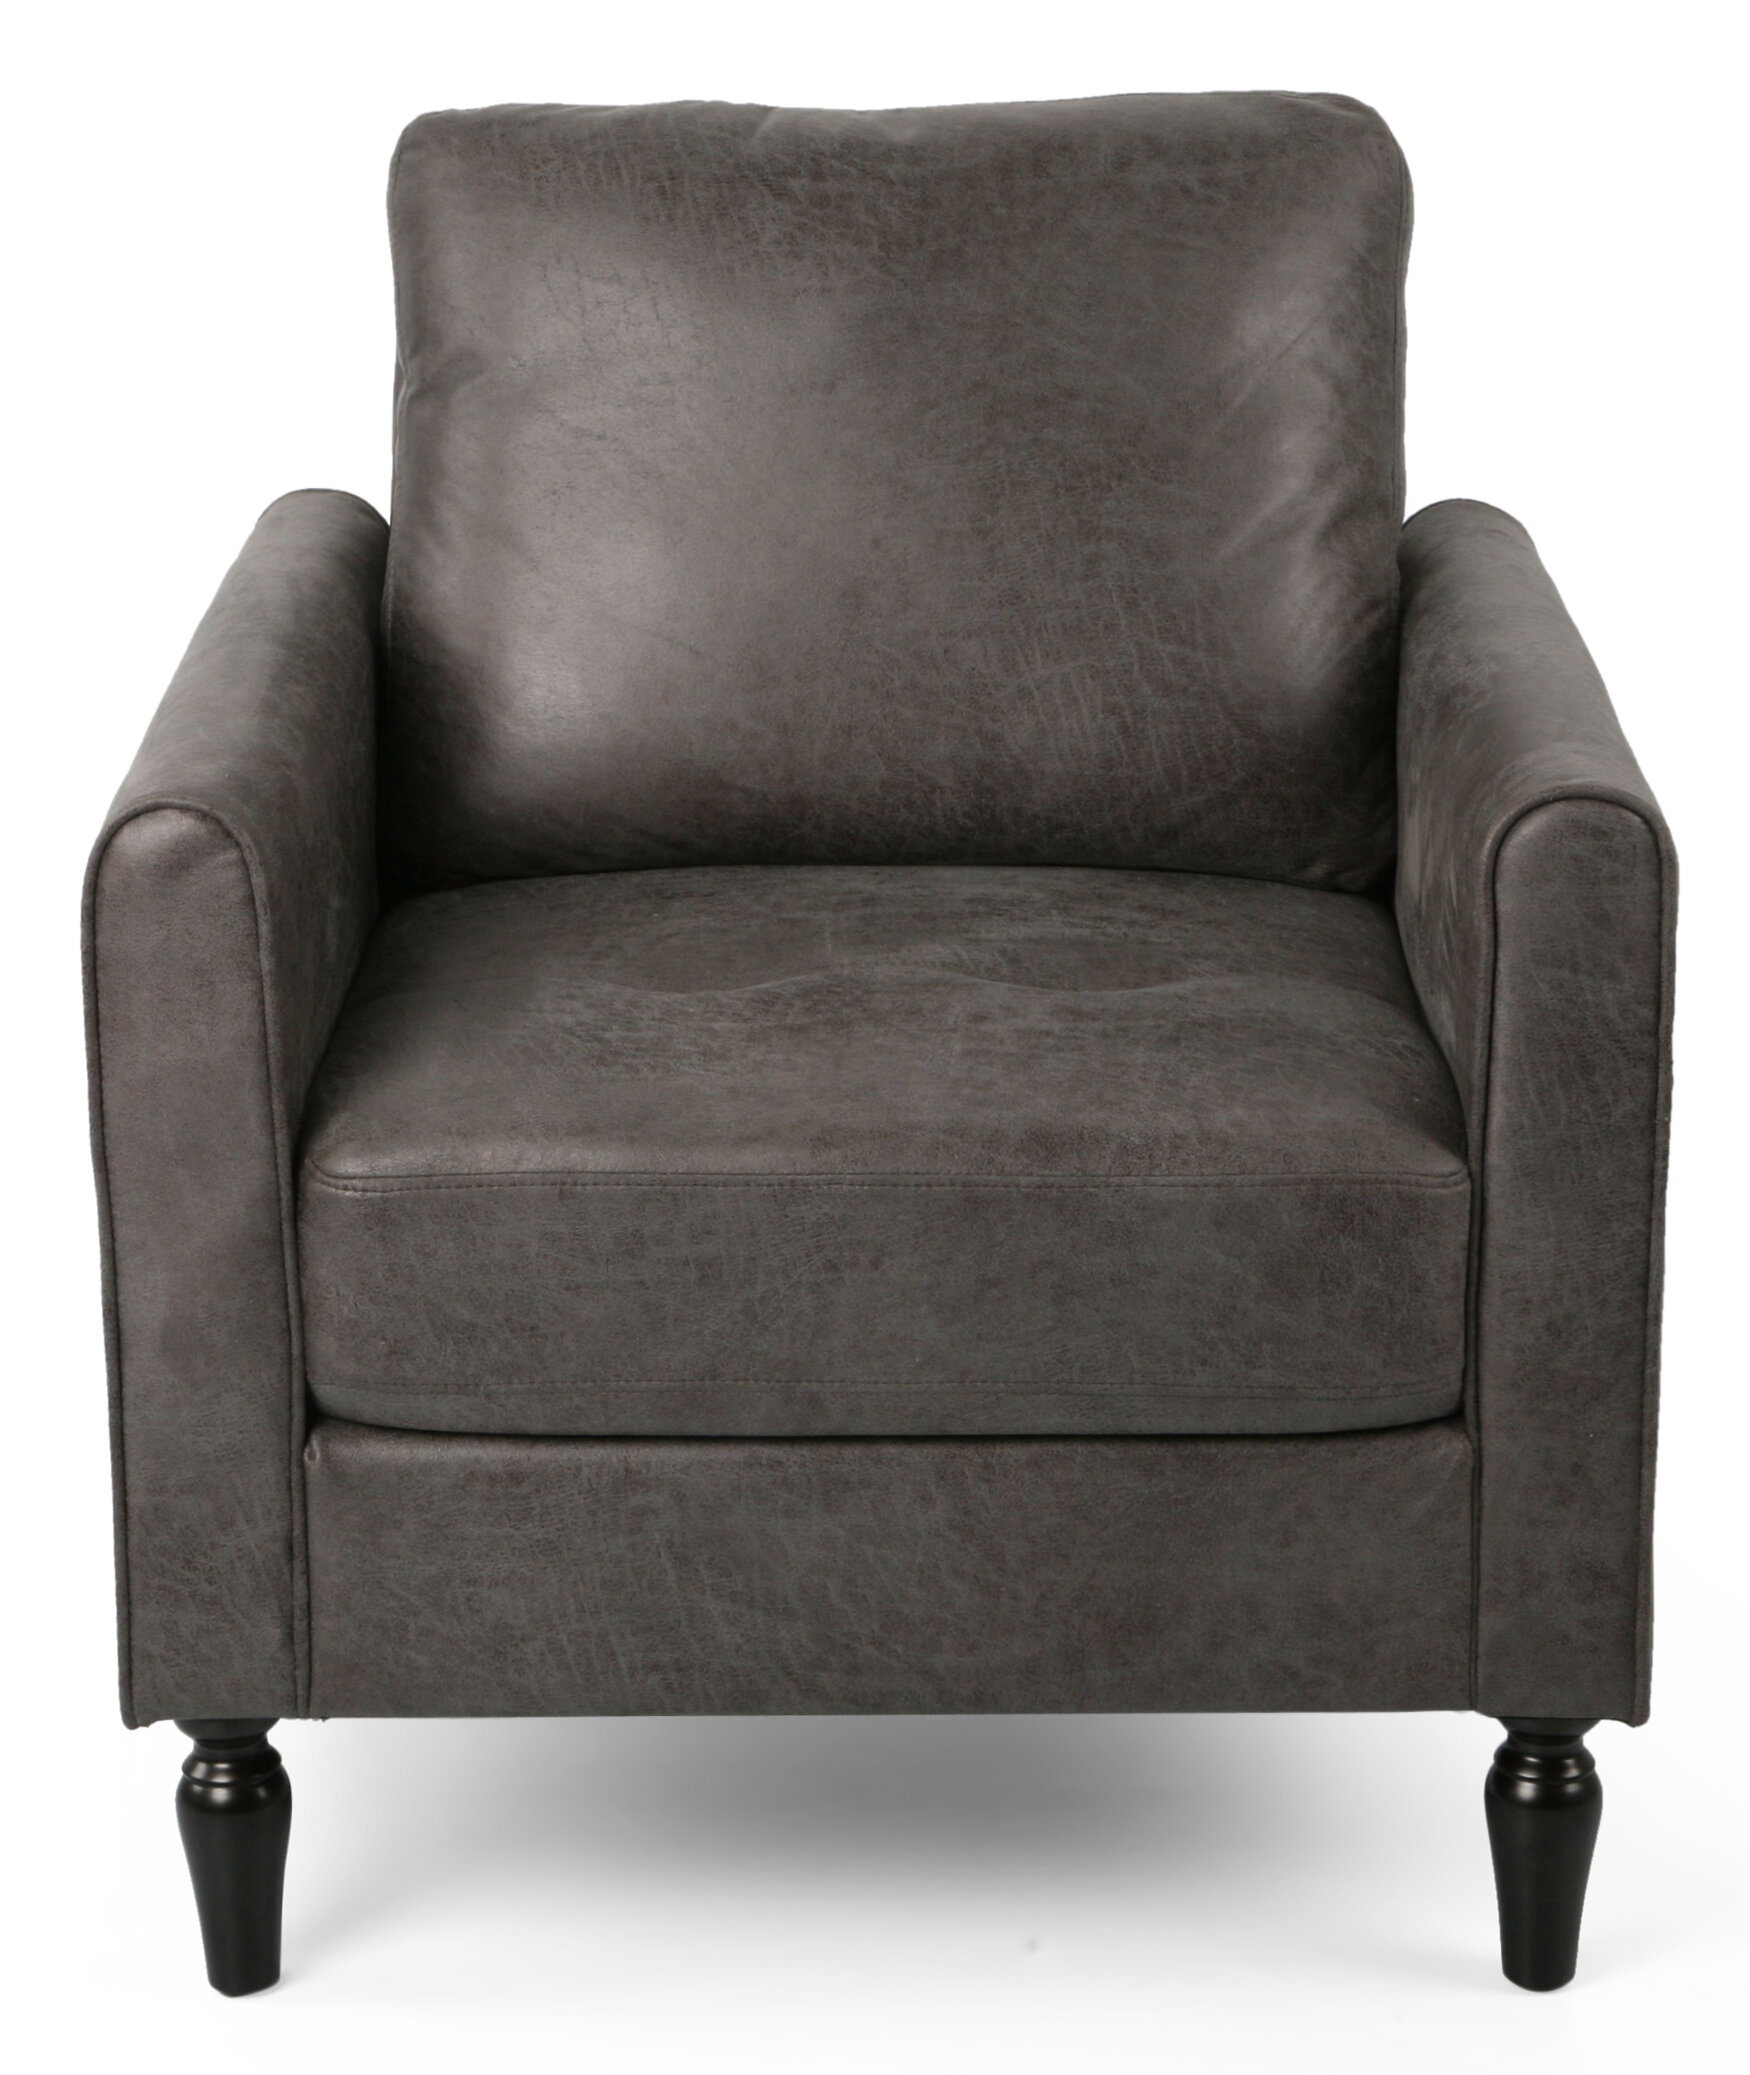 Genial Gordonsville Contemporary Club Chair